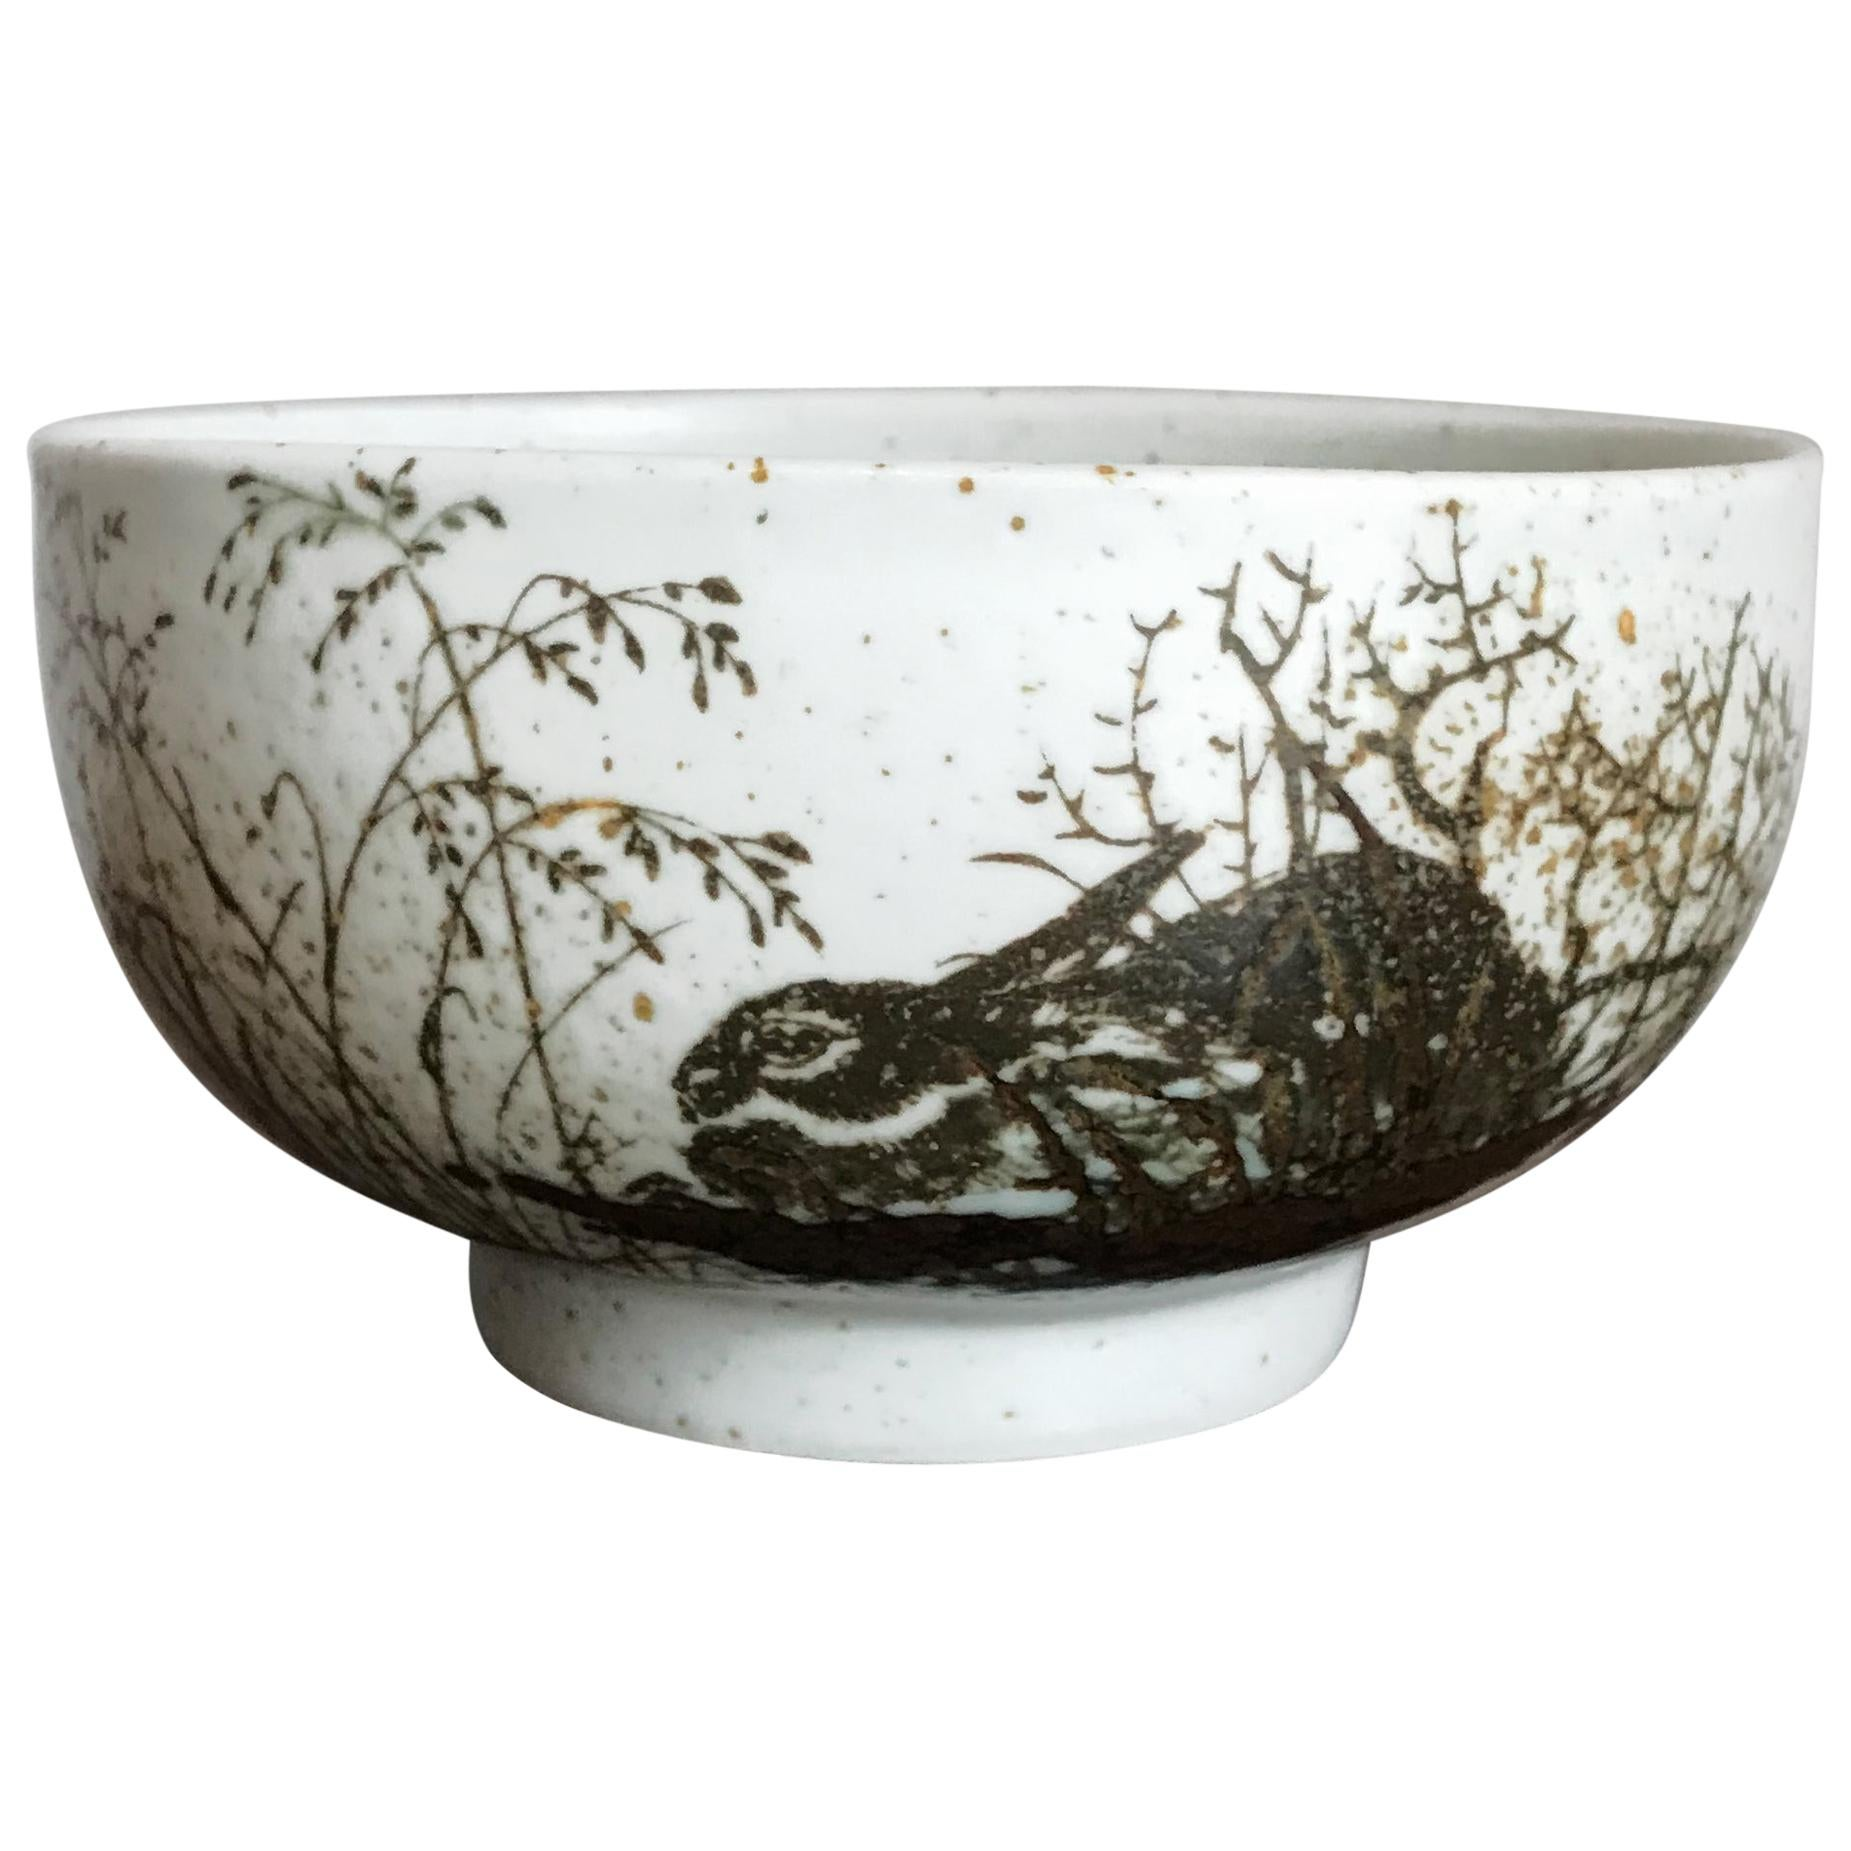 Nils Thorsson for Royal Copenhagen Scandinavian Ceramic Bowl, 1960s